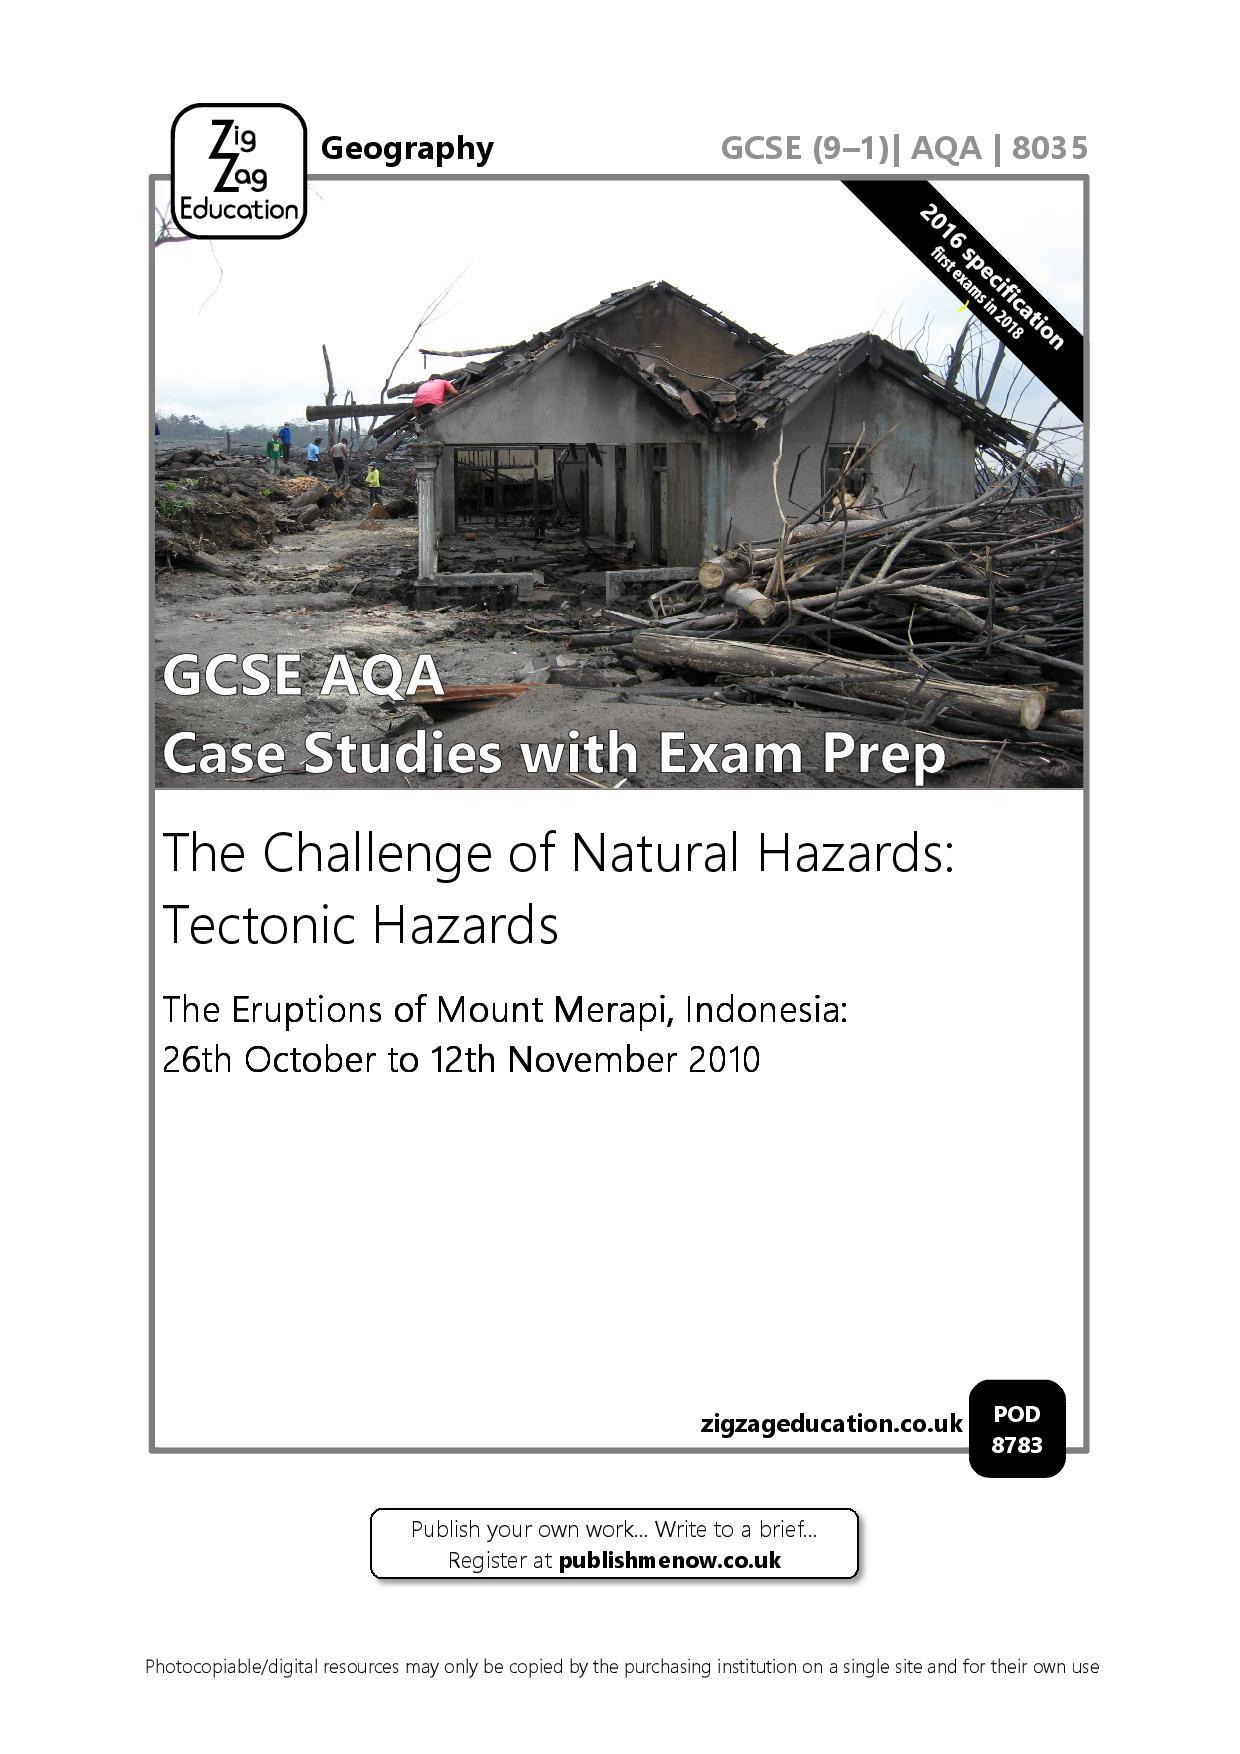 GCSE AQA Case Studies with Exam Prep.